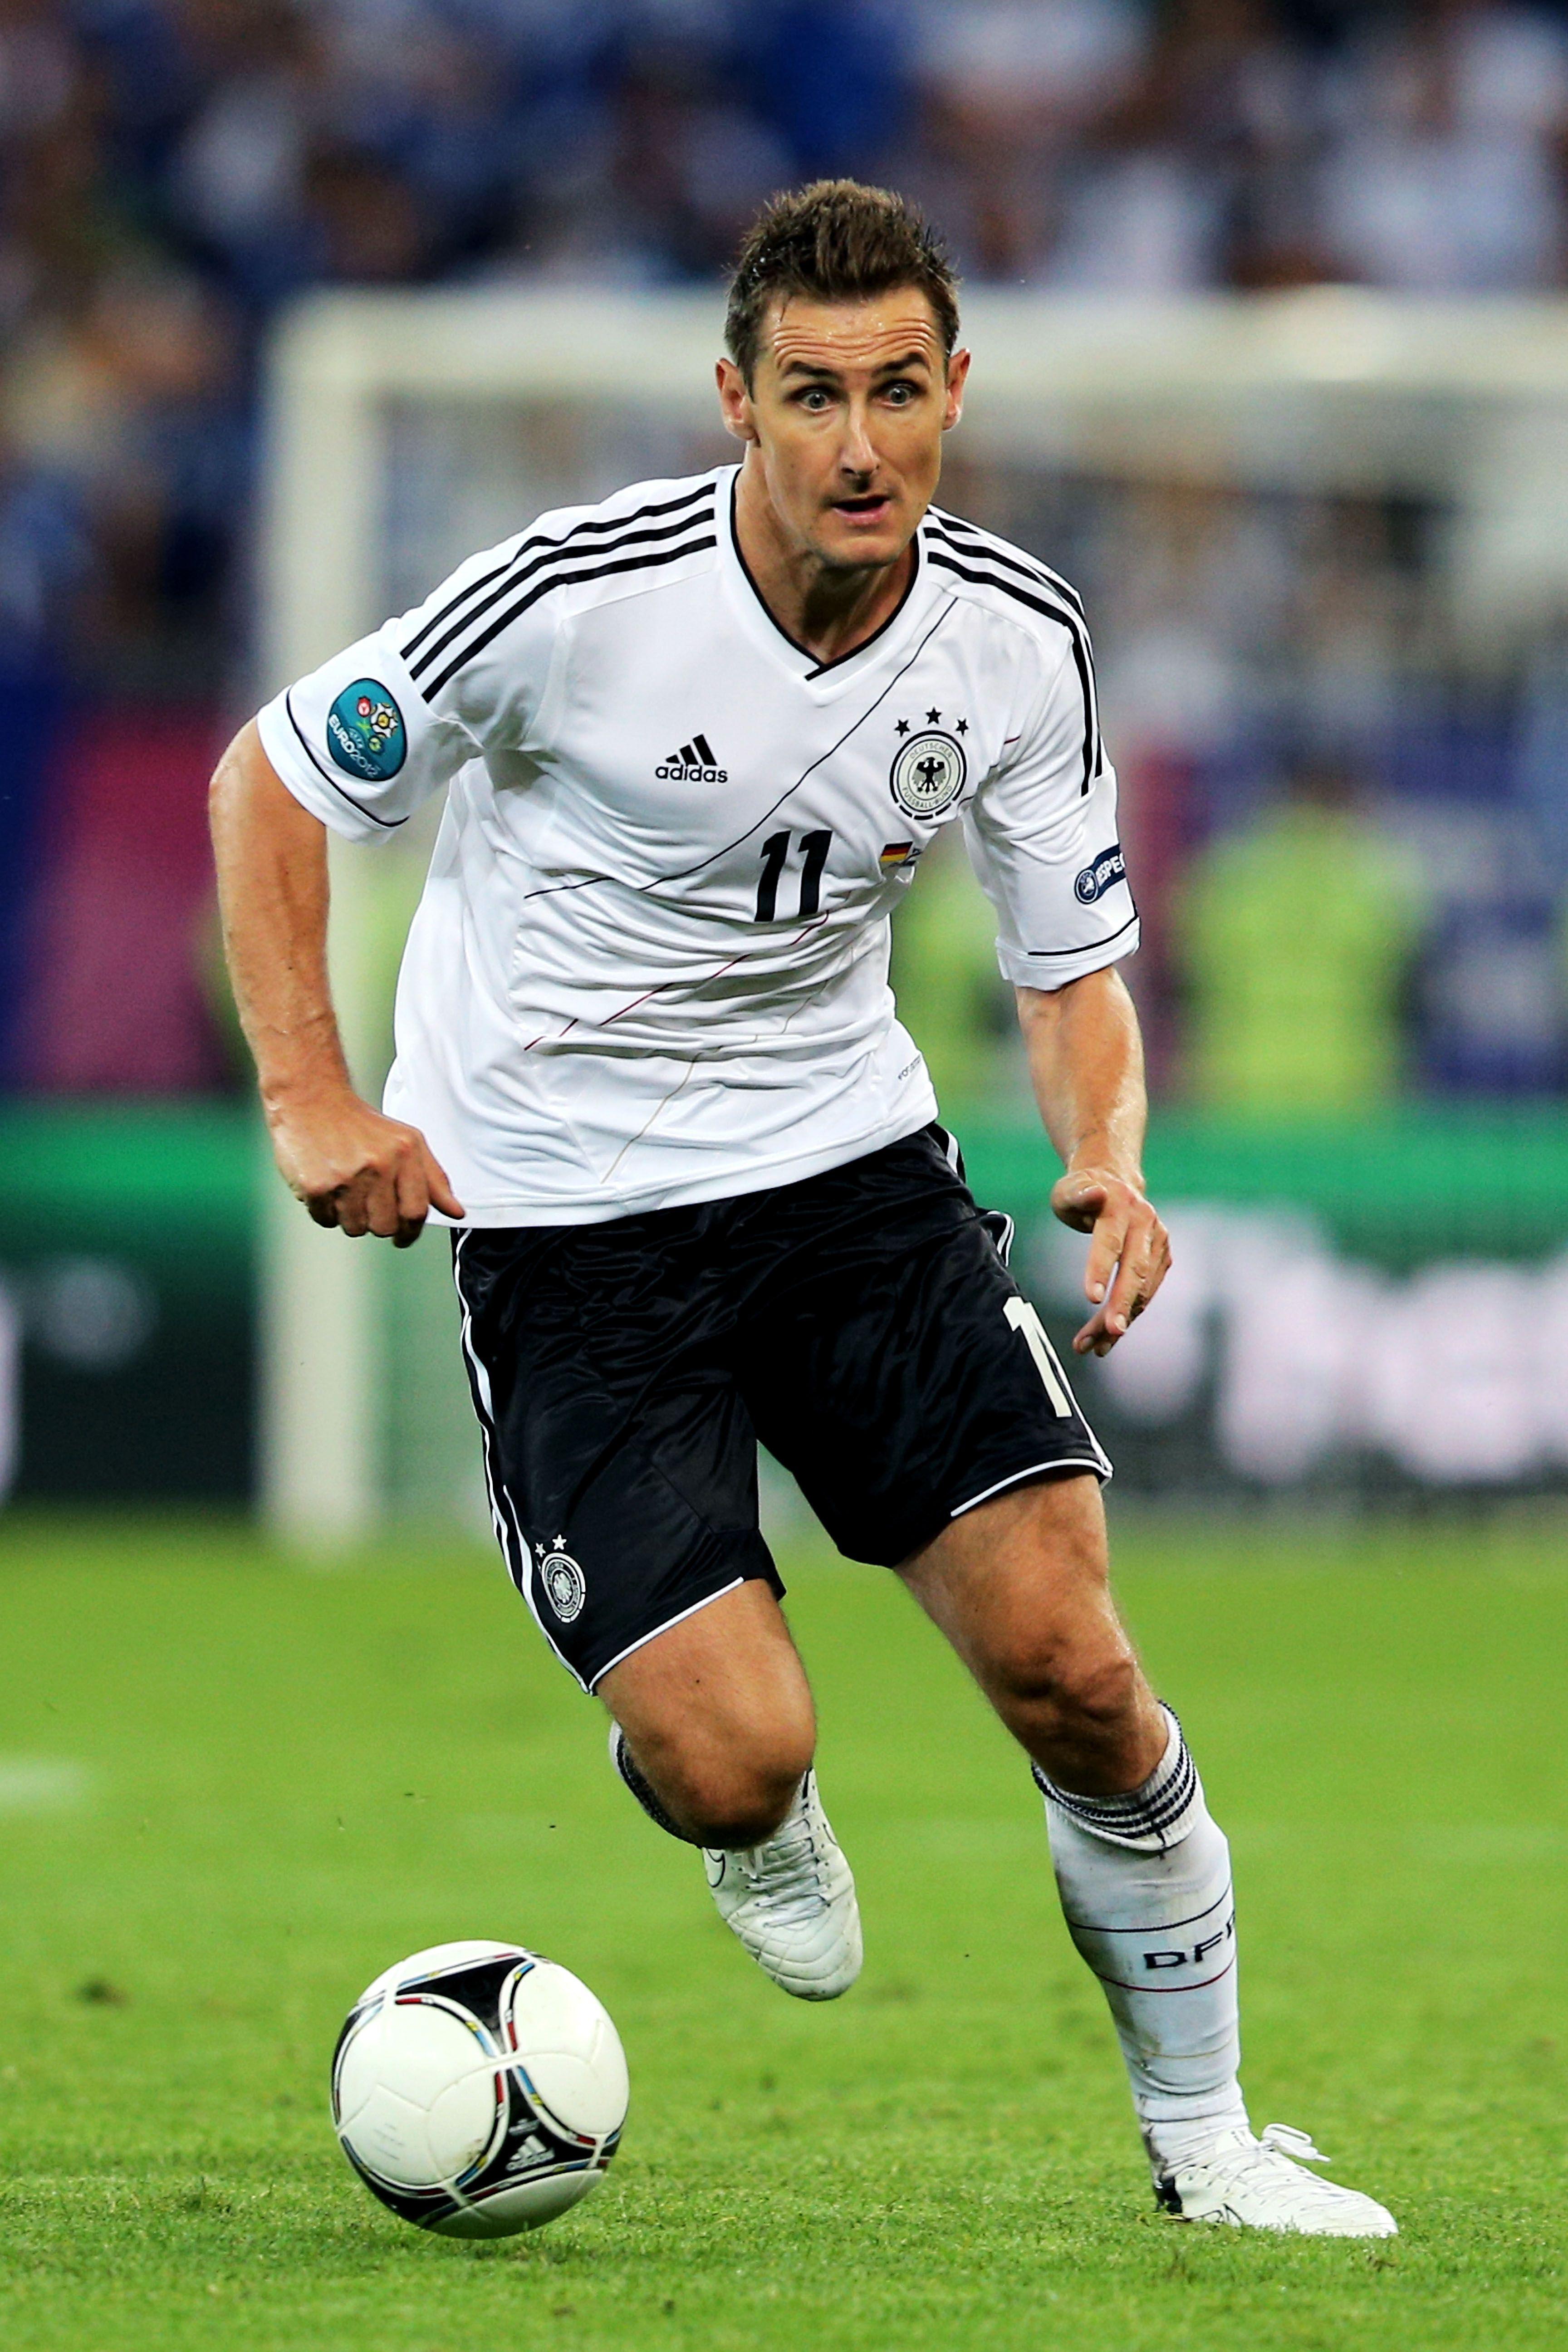 Miroslav Klose On The Germany National Team Lazio Striker Most World Cup Goals 16 Miroslav Klose Lendas Do Futebol Bayern